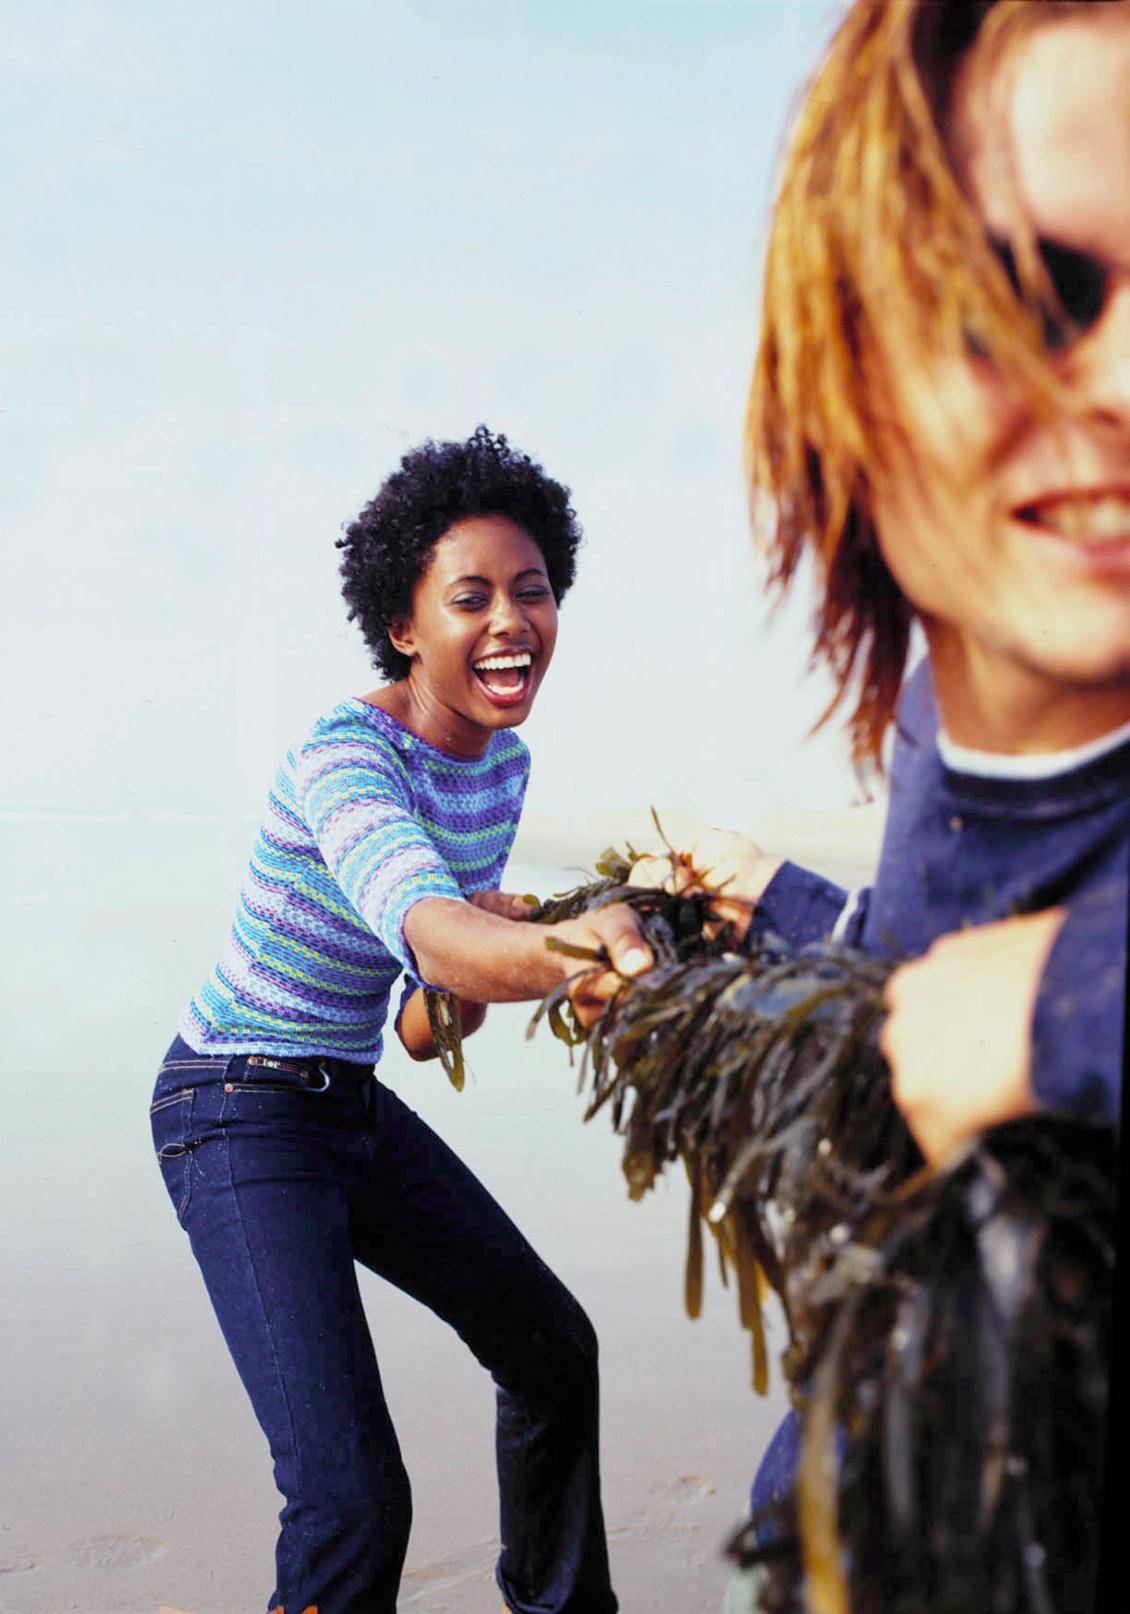 playful teens on beach photo art director